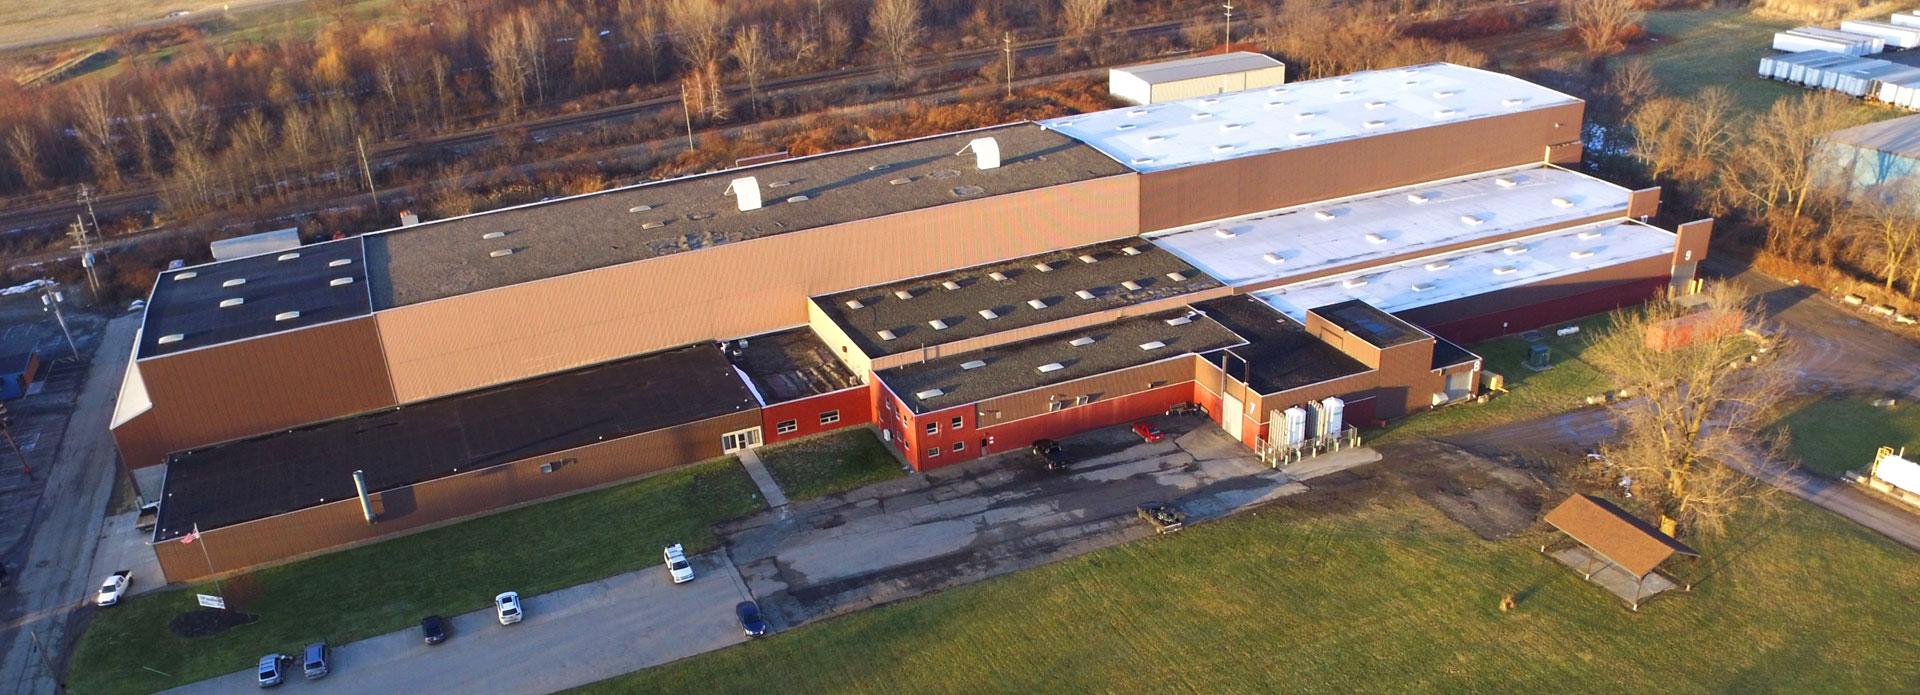 Drone shot of The Warren Company